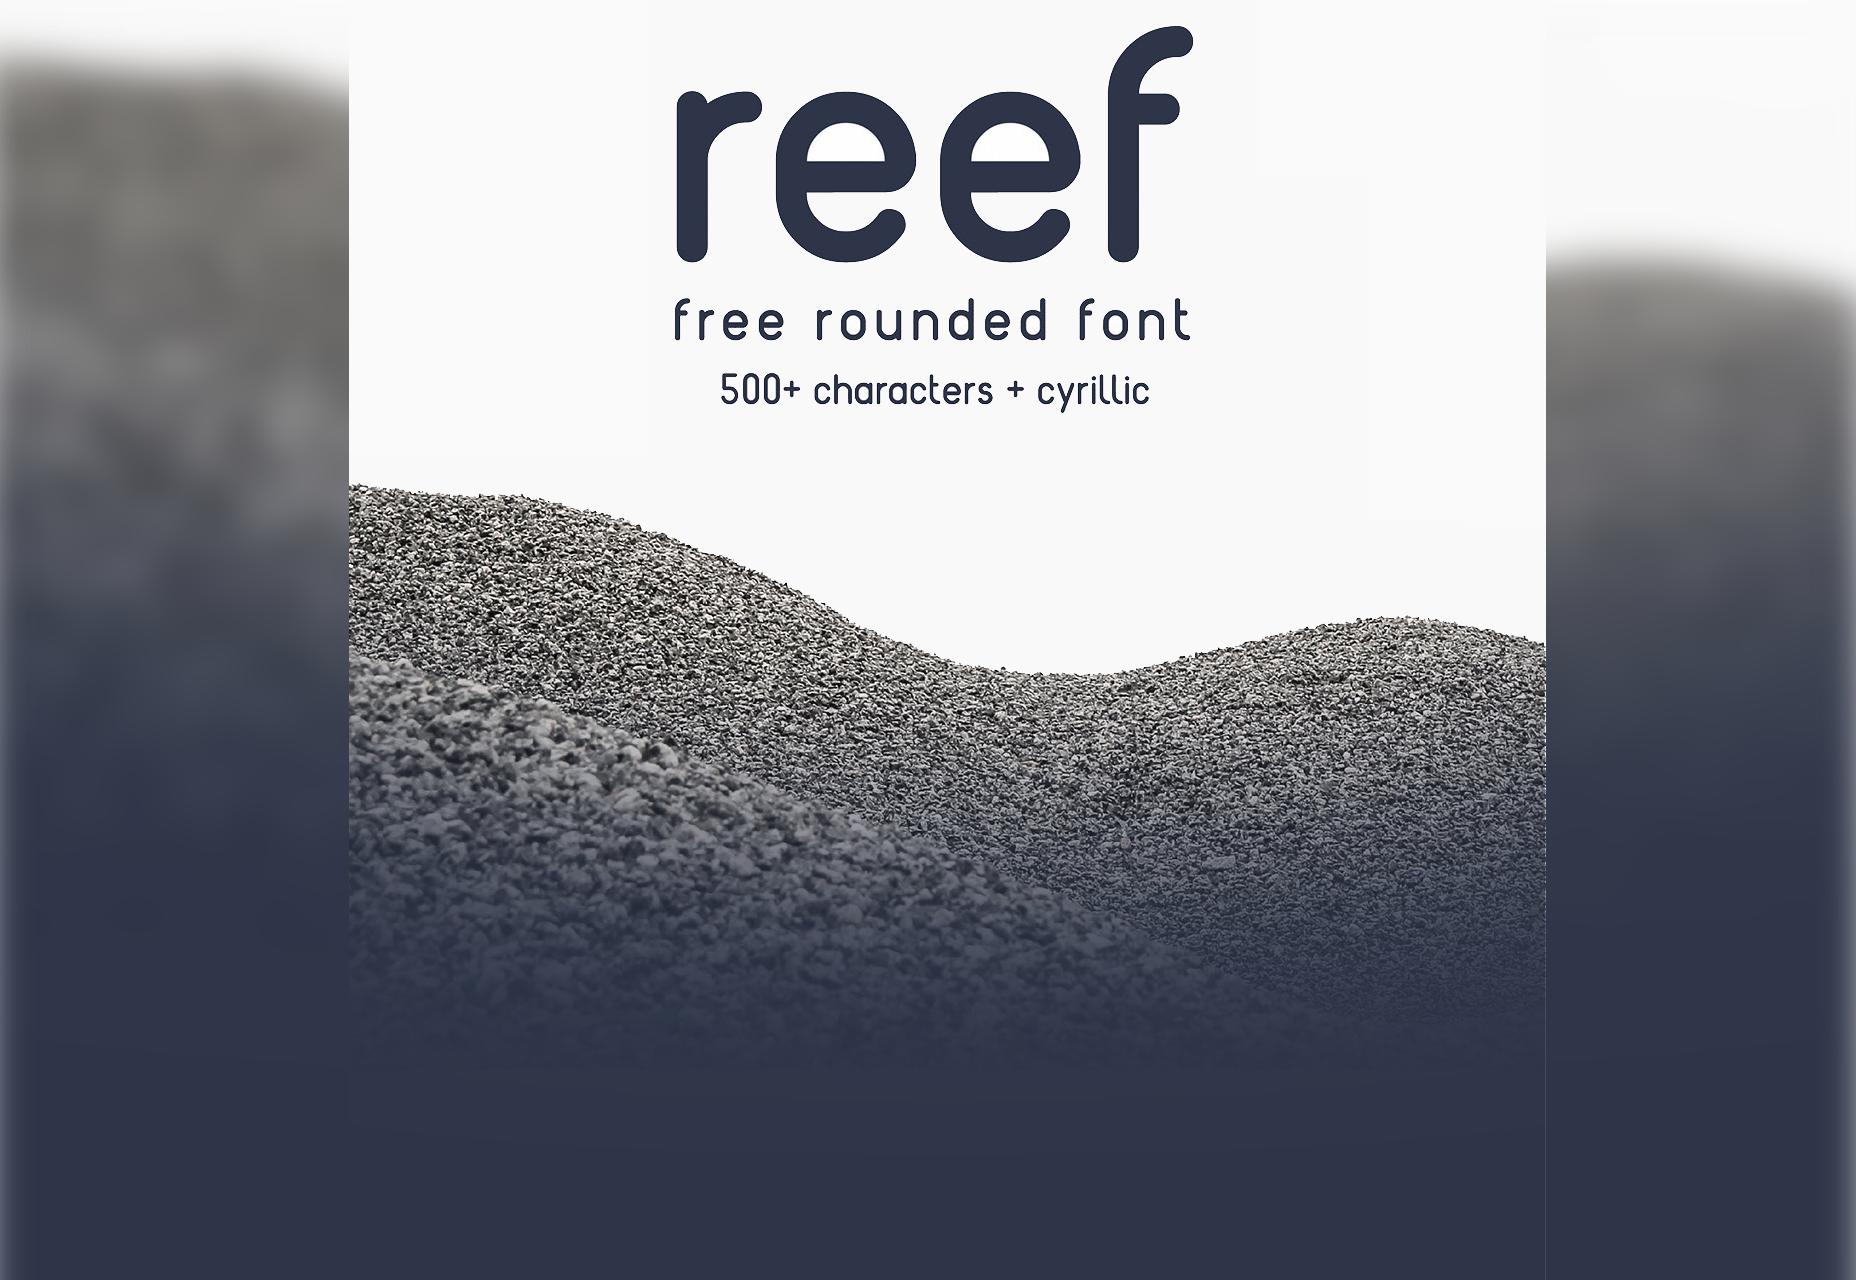 Rif: ronde rand letterbeeld